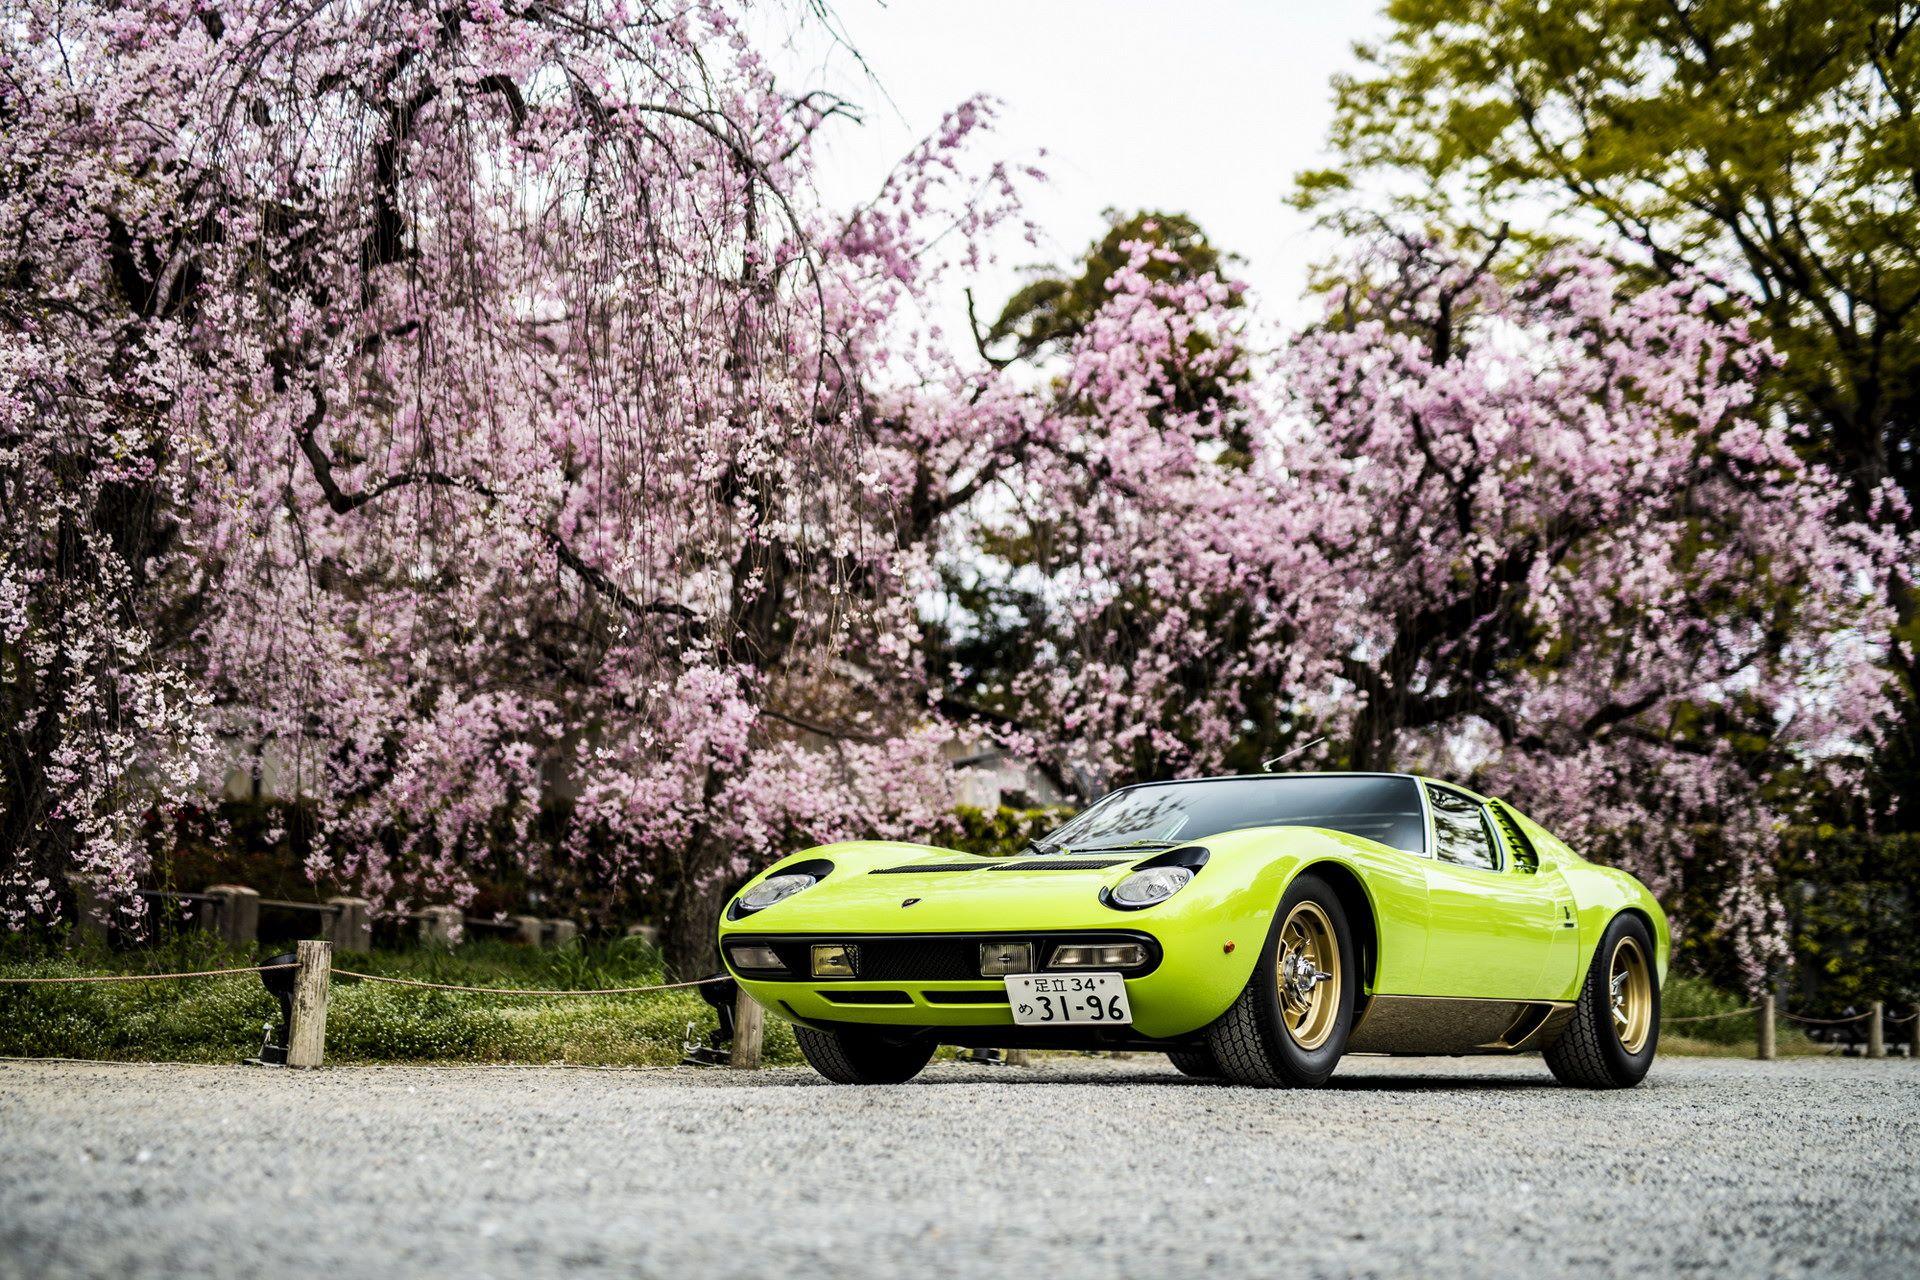 Lamborghini-Miura-SV-turns-50-20